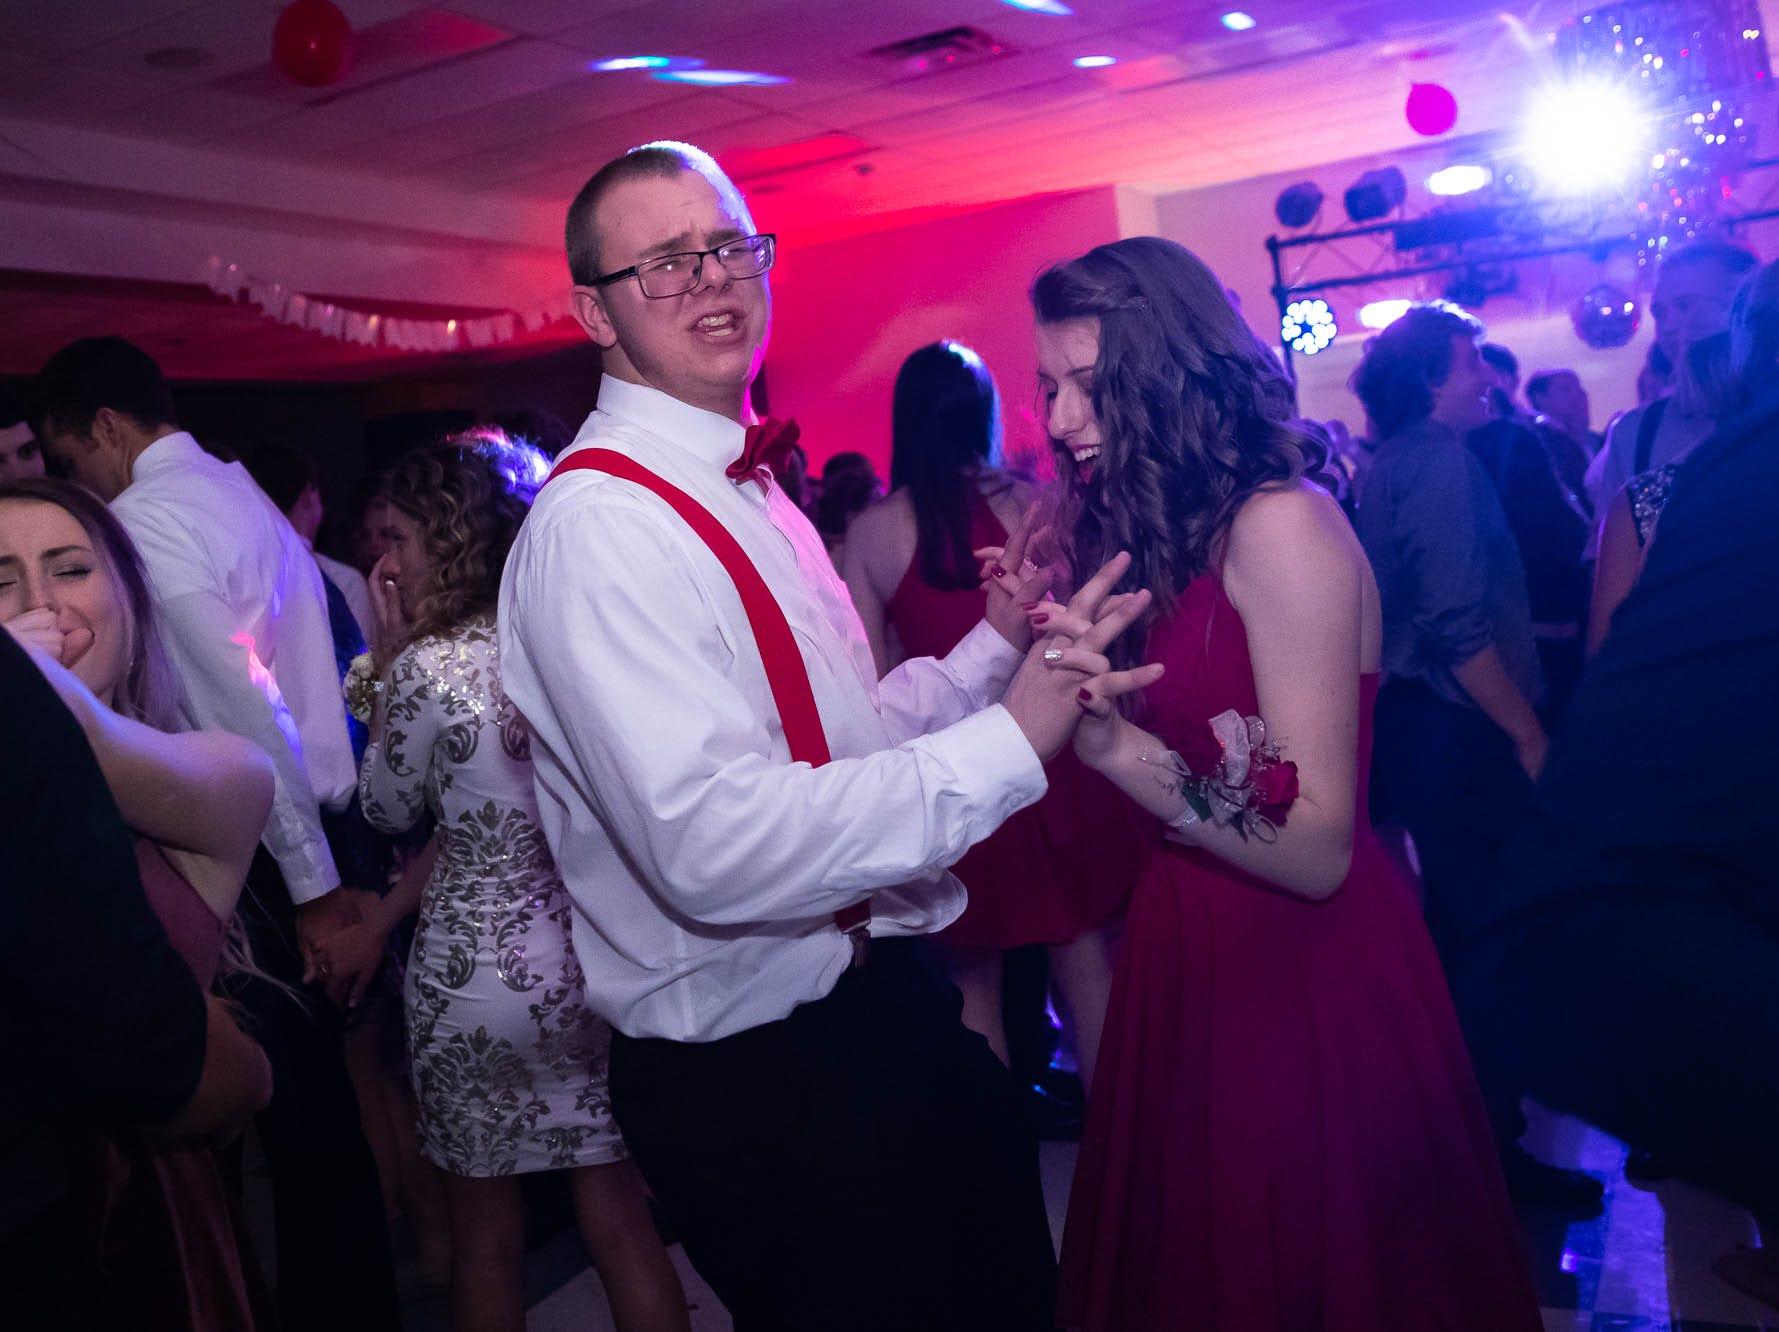 Littlestown High School students attend their homecoming dance, Saturday, Oct. 13, 2018, at Littlestown High School.